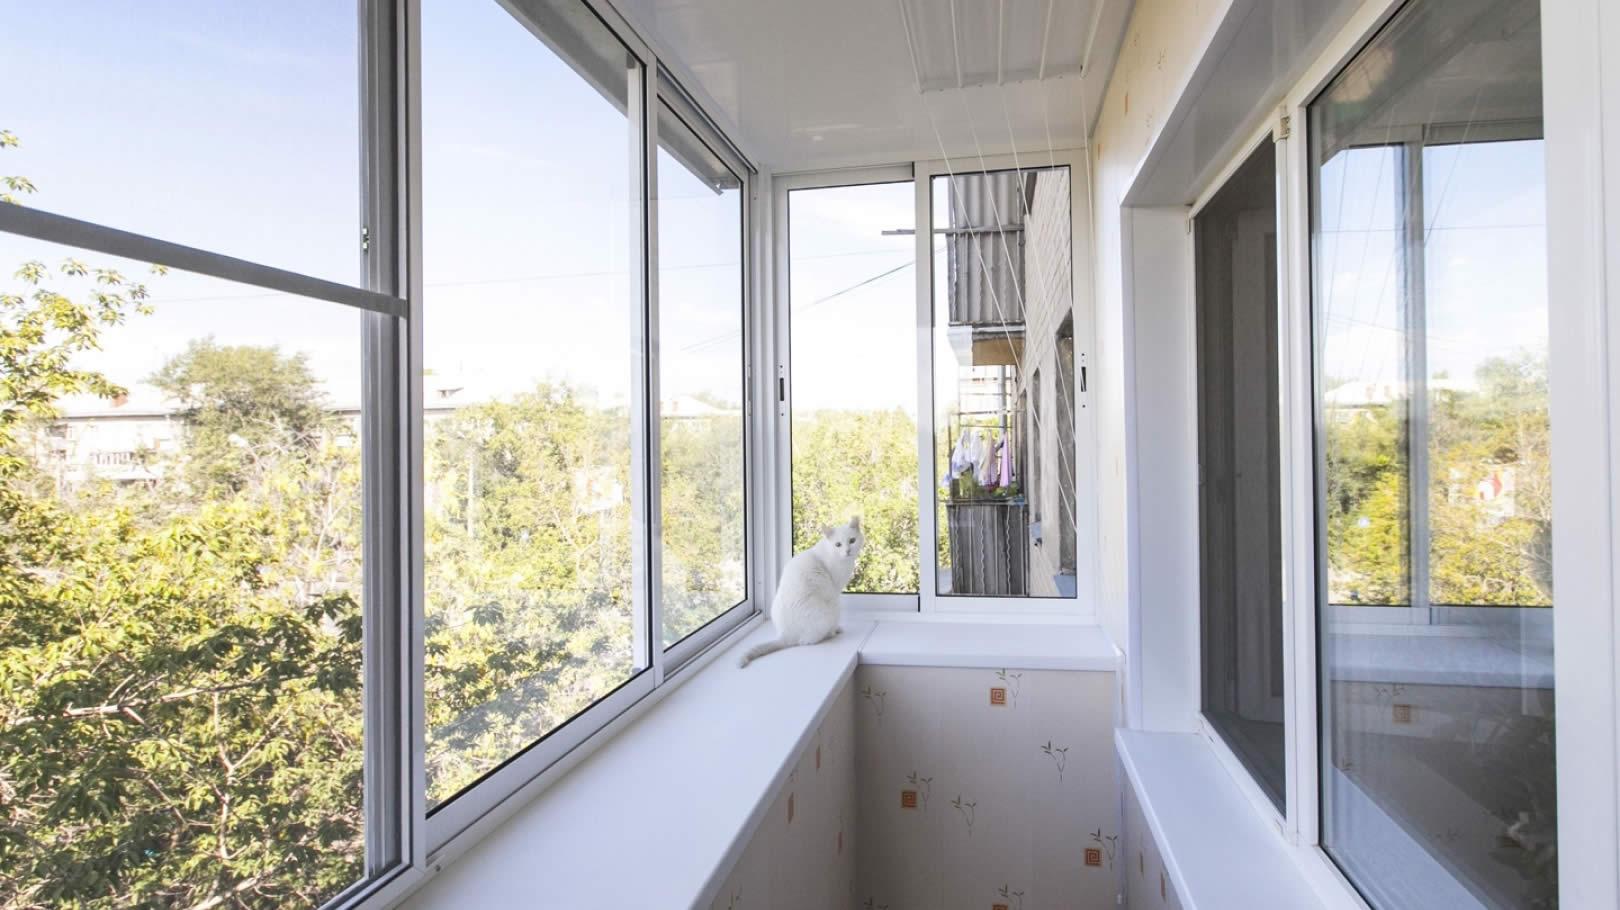 Балкон под ключ в Киеве  изготовление и монтаж от